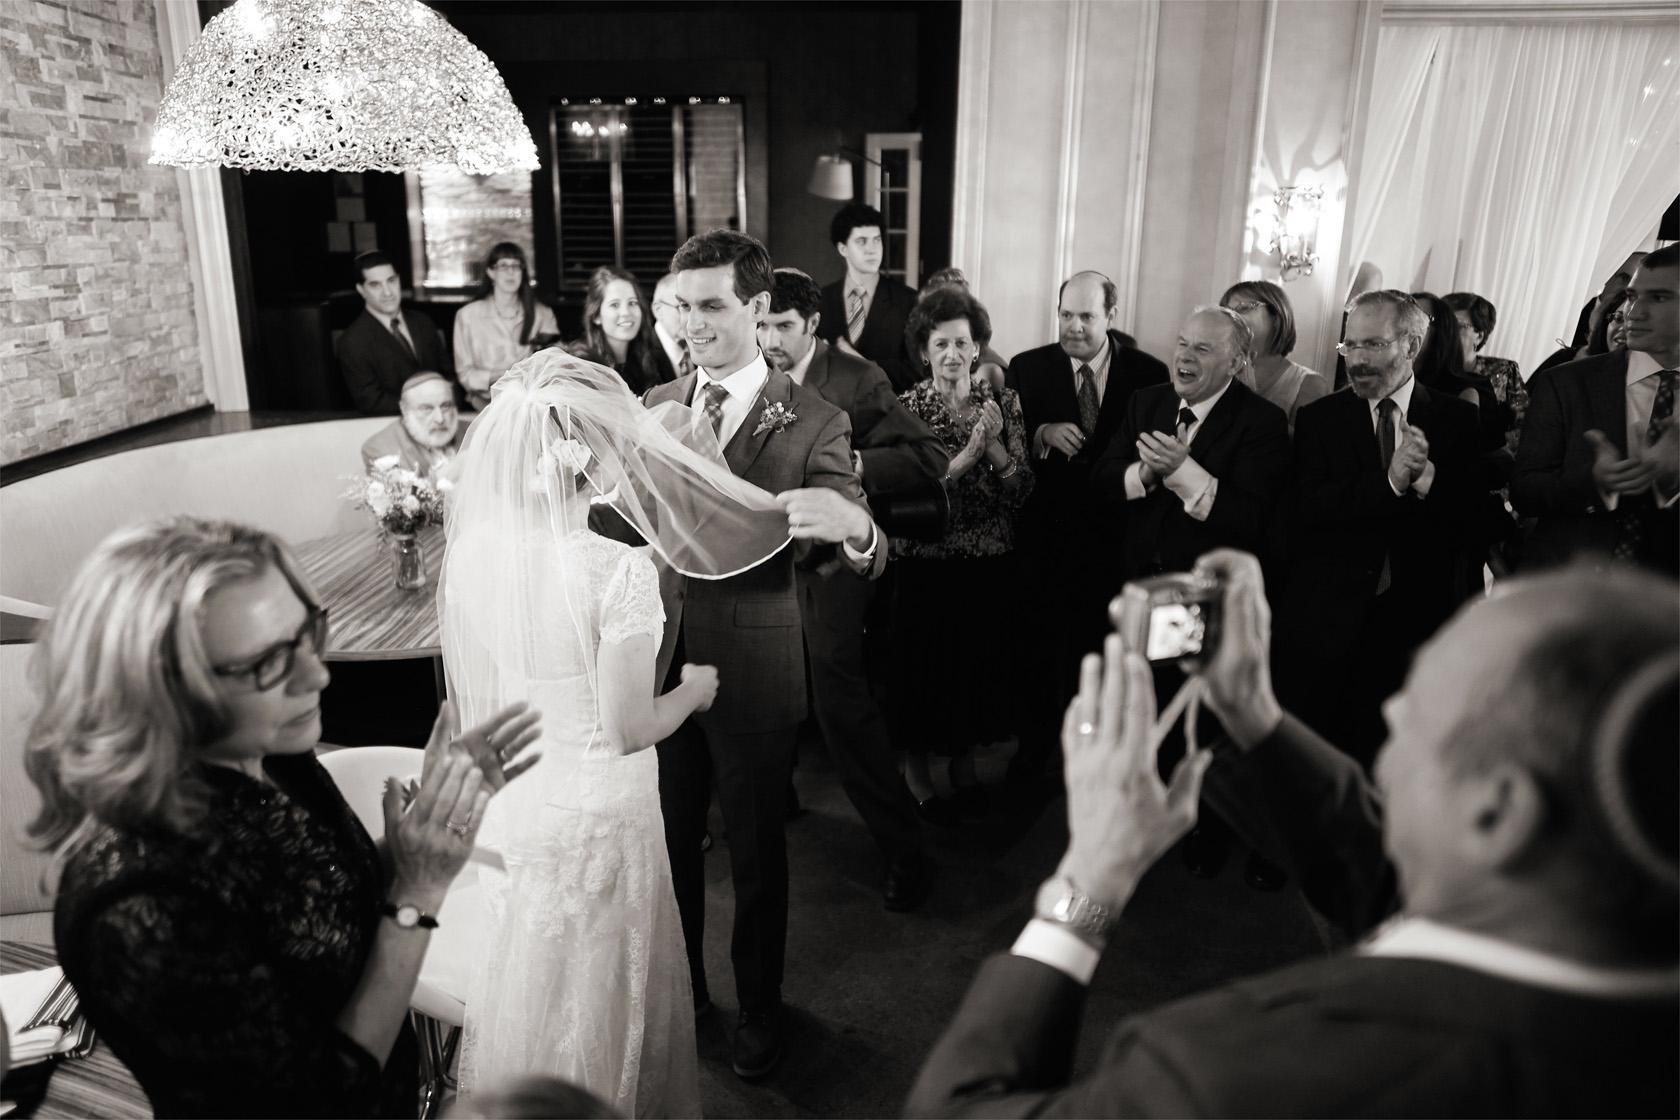 steve-sager-0050_gladstone hotel wedding